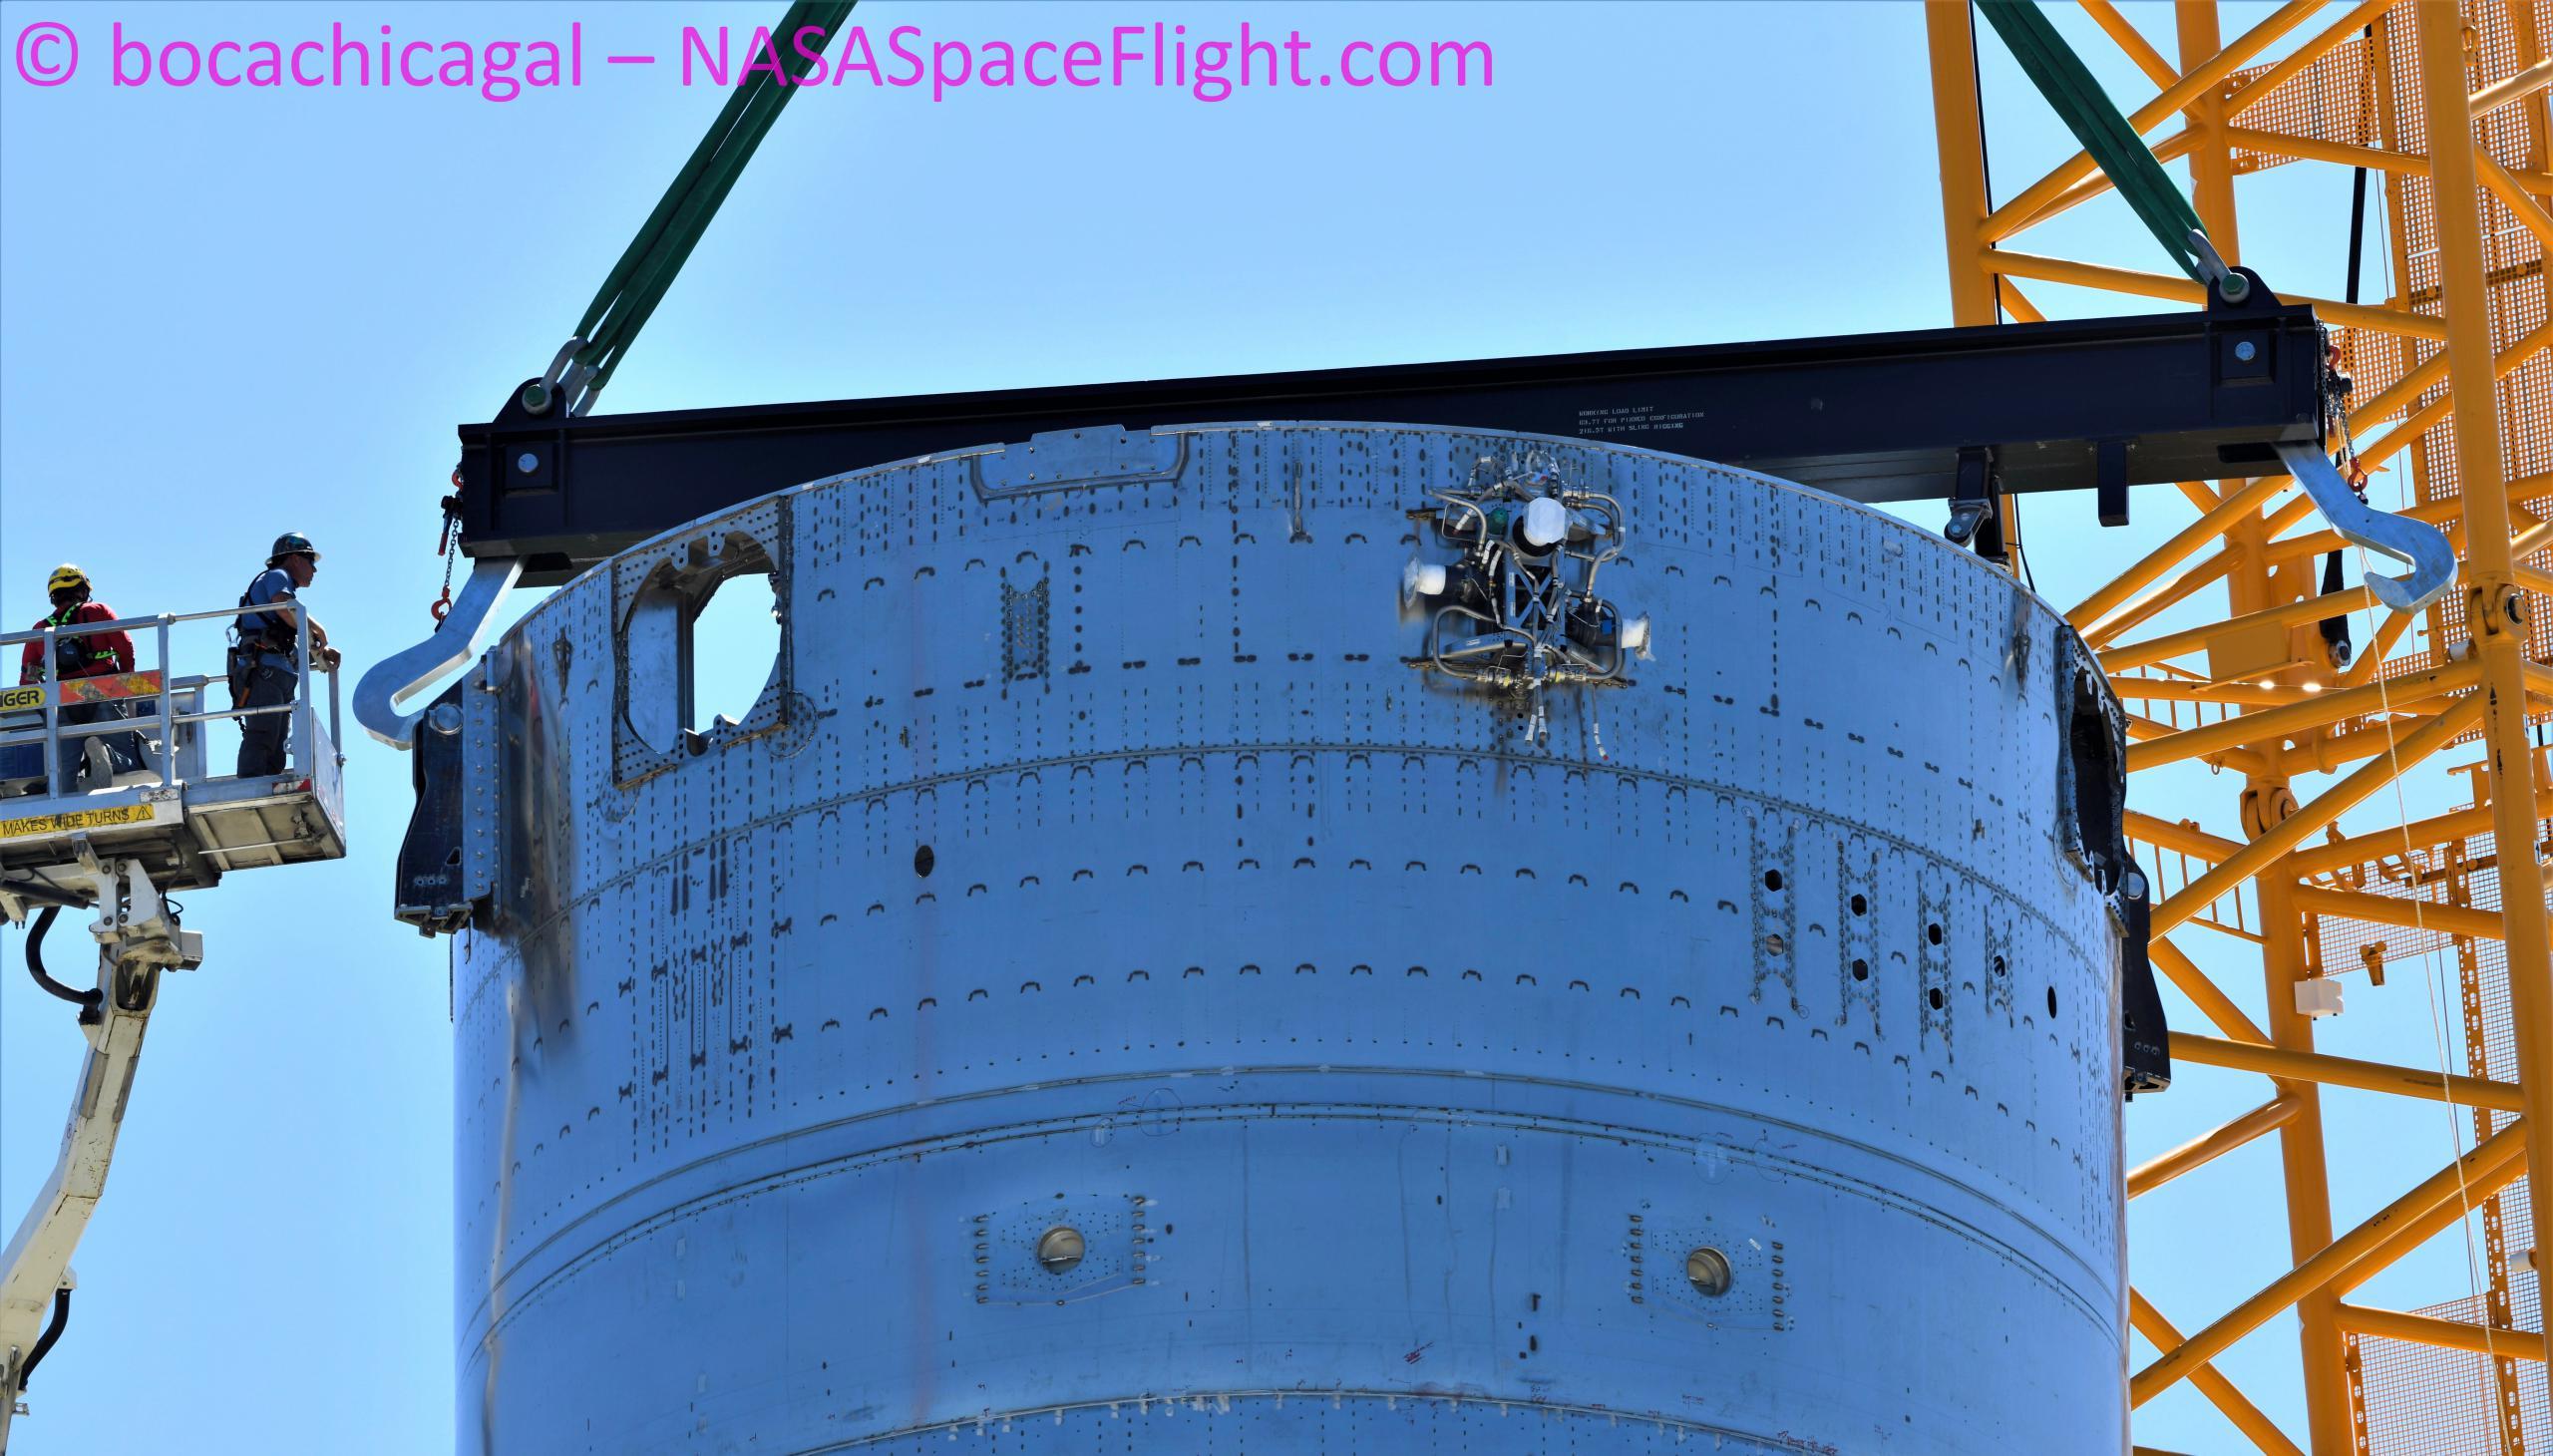 Starship Boca Chica 070121 (NASASpaceflight – bocachicagal) Booster 3 B3 pad install fwd view + thrusters 1 (c)